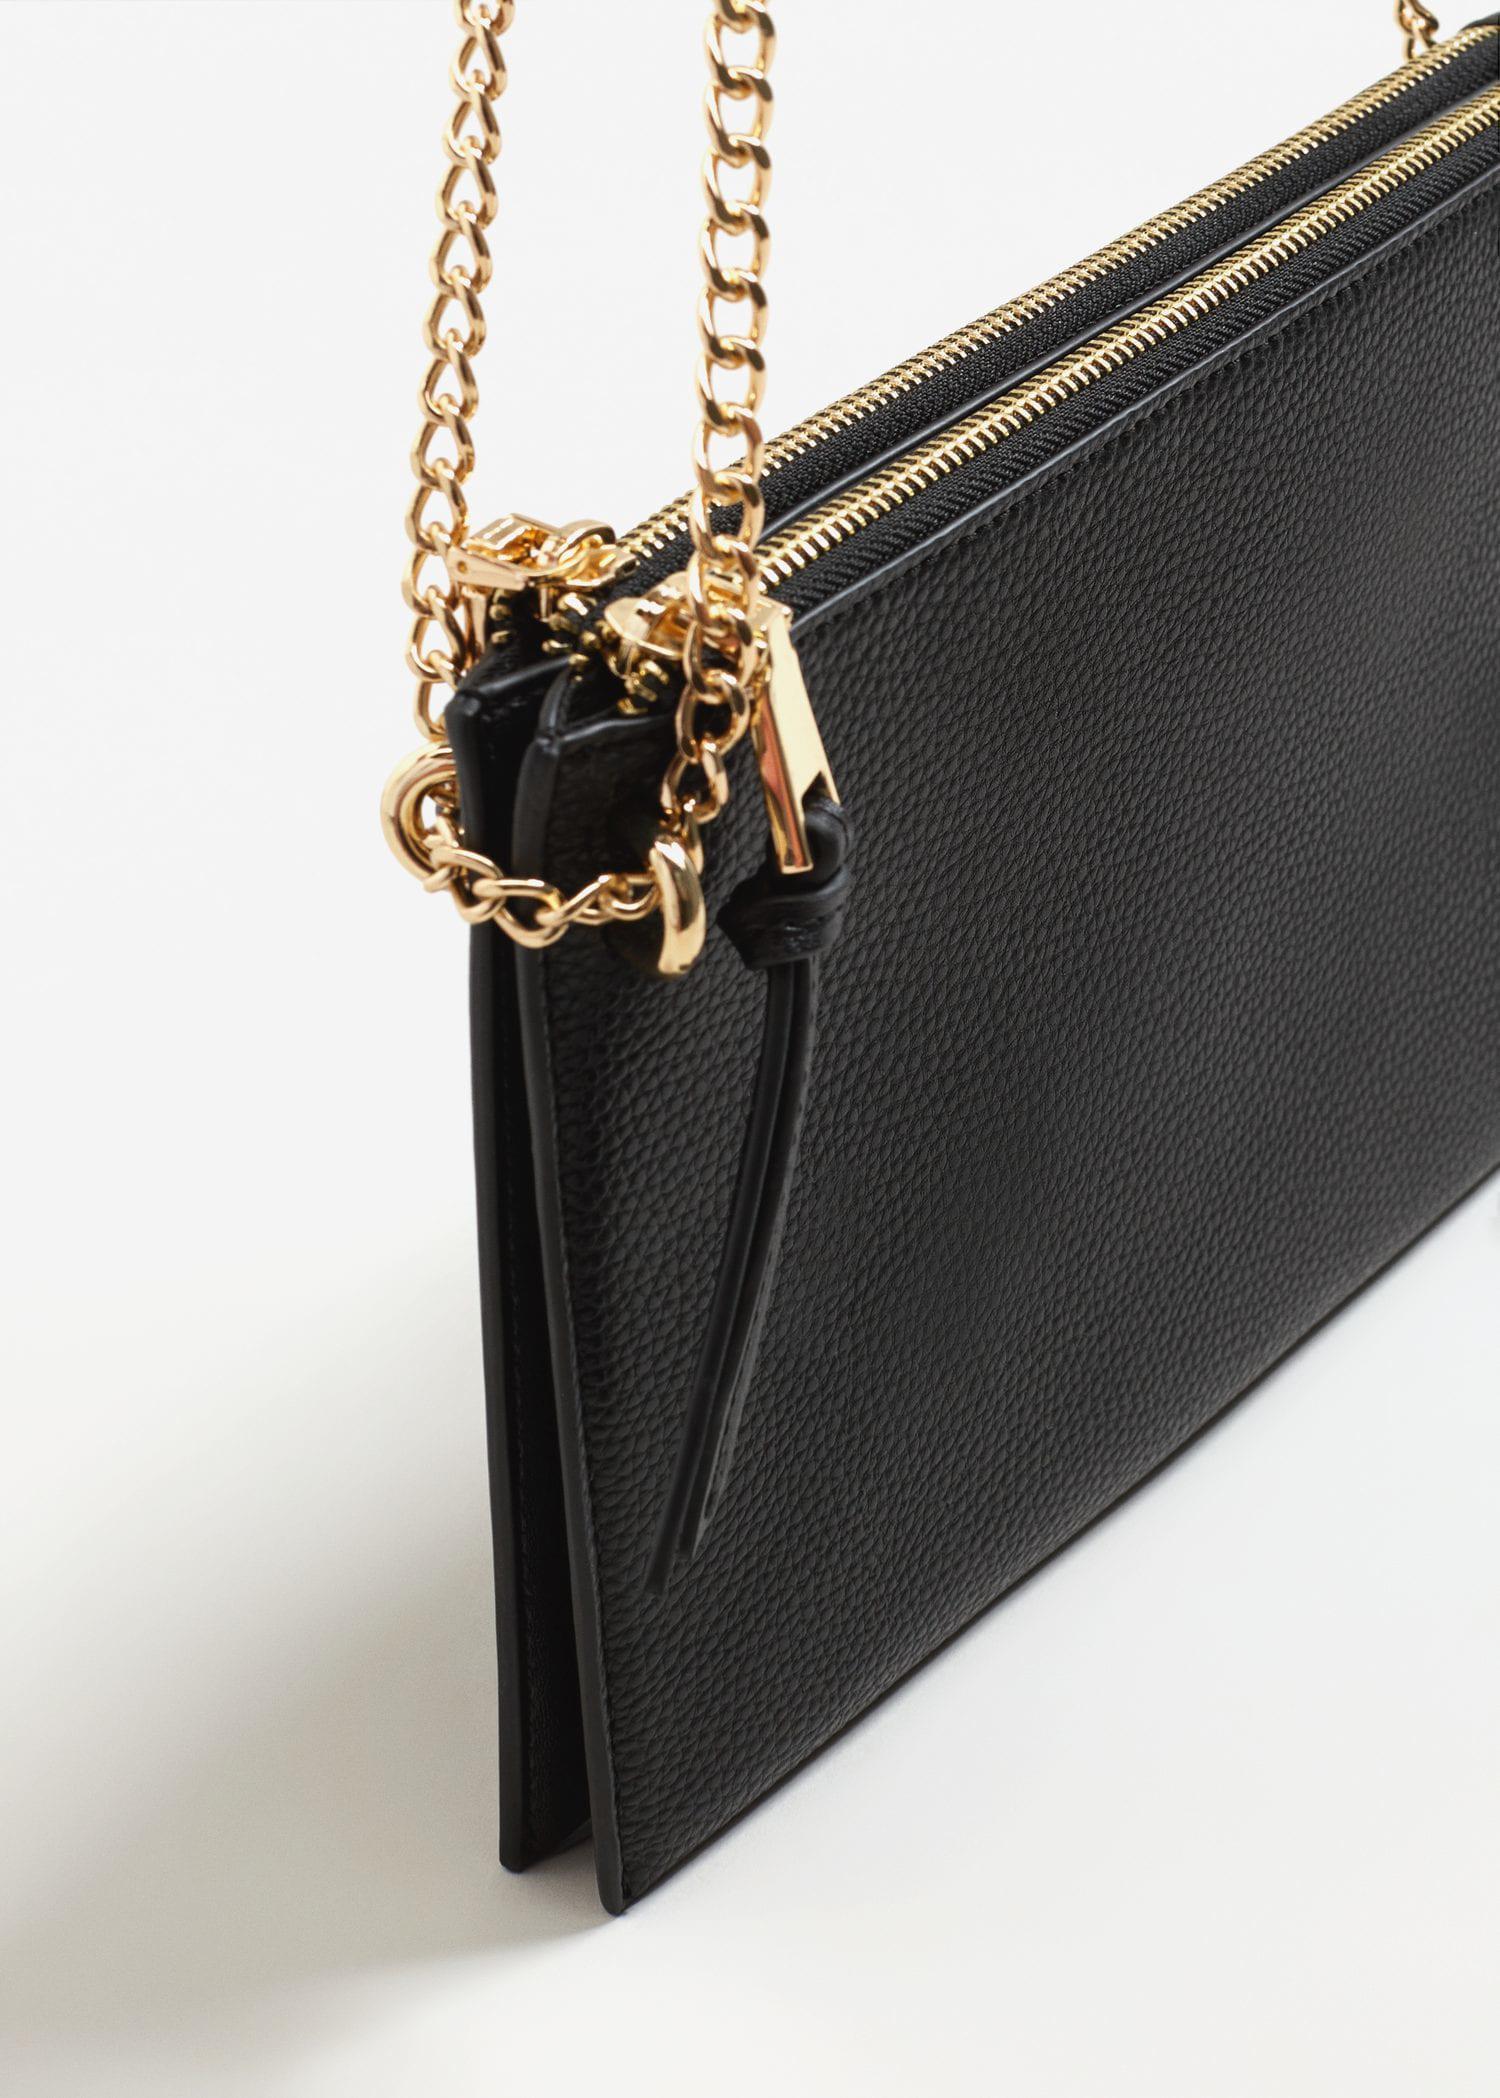 Mango Leather Pebbled Cross-body Bag in Black